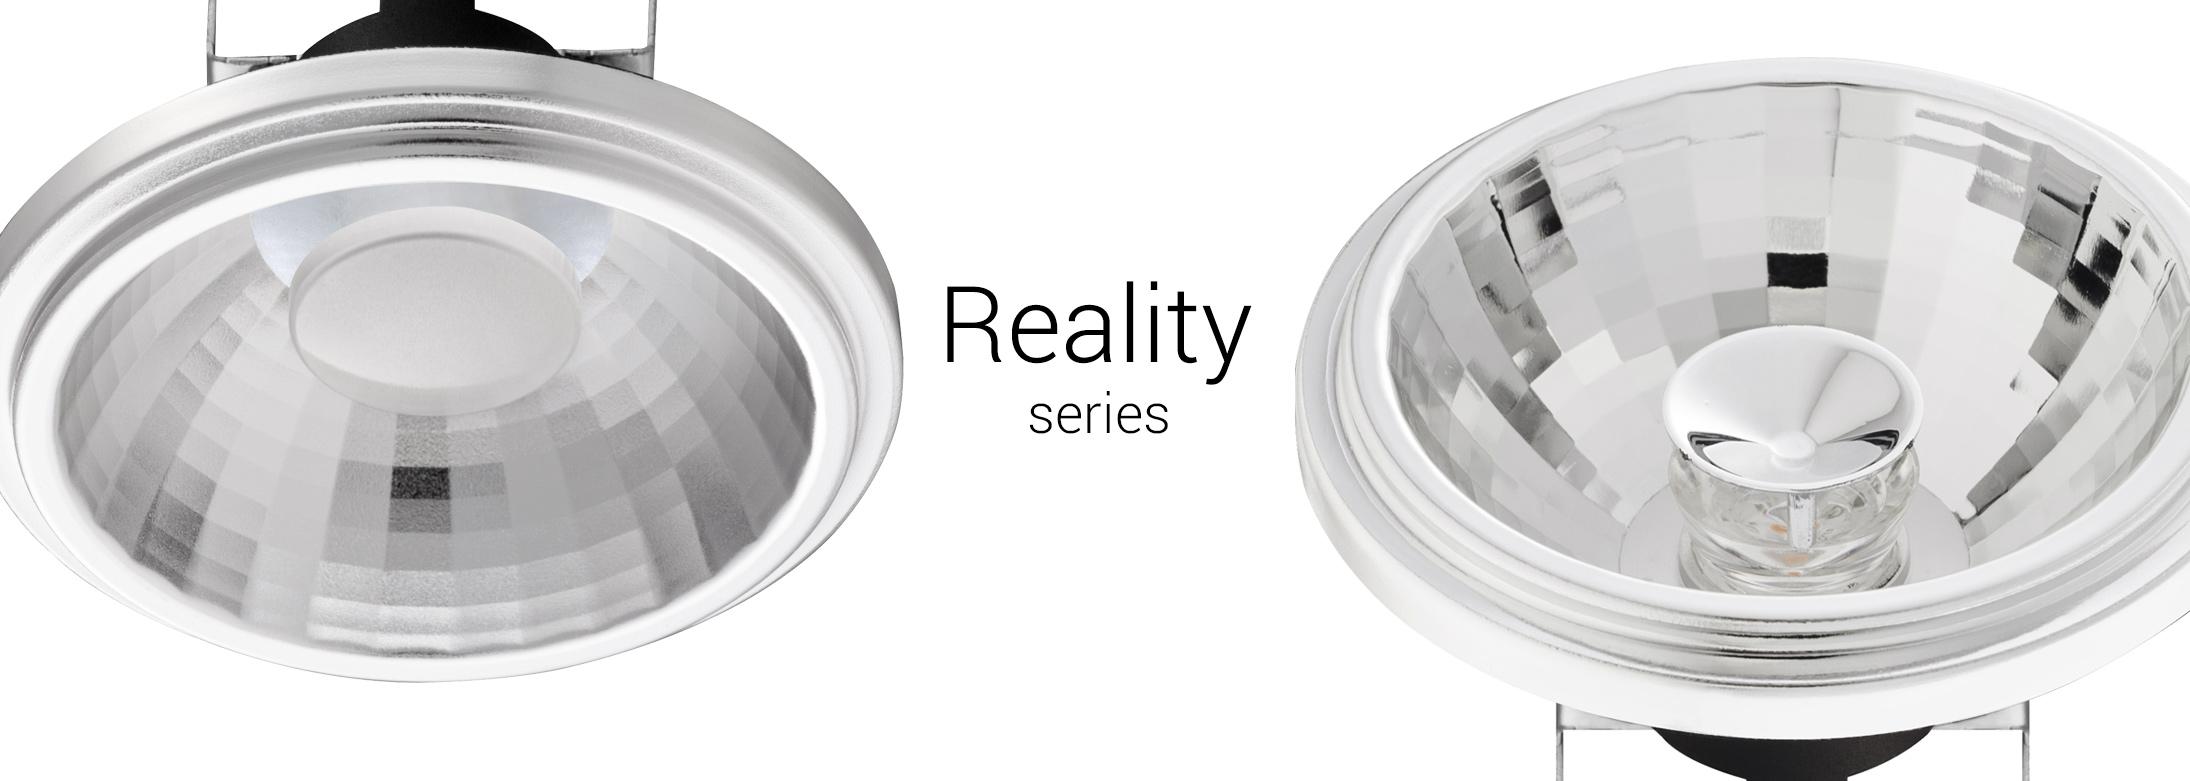 Reality Series